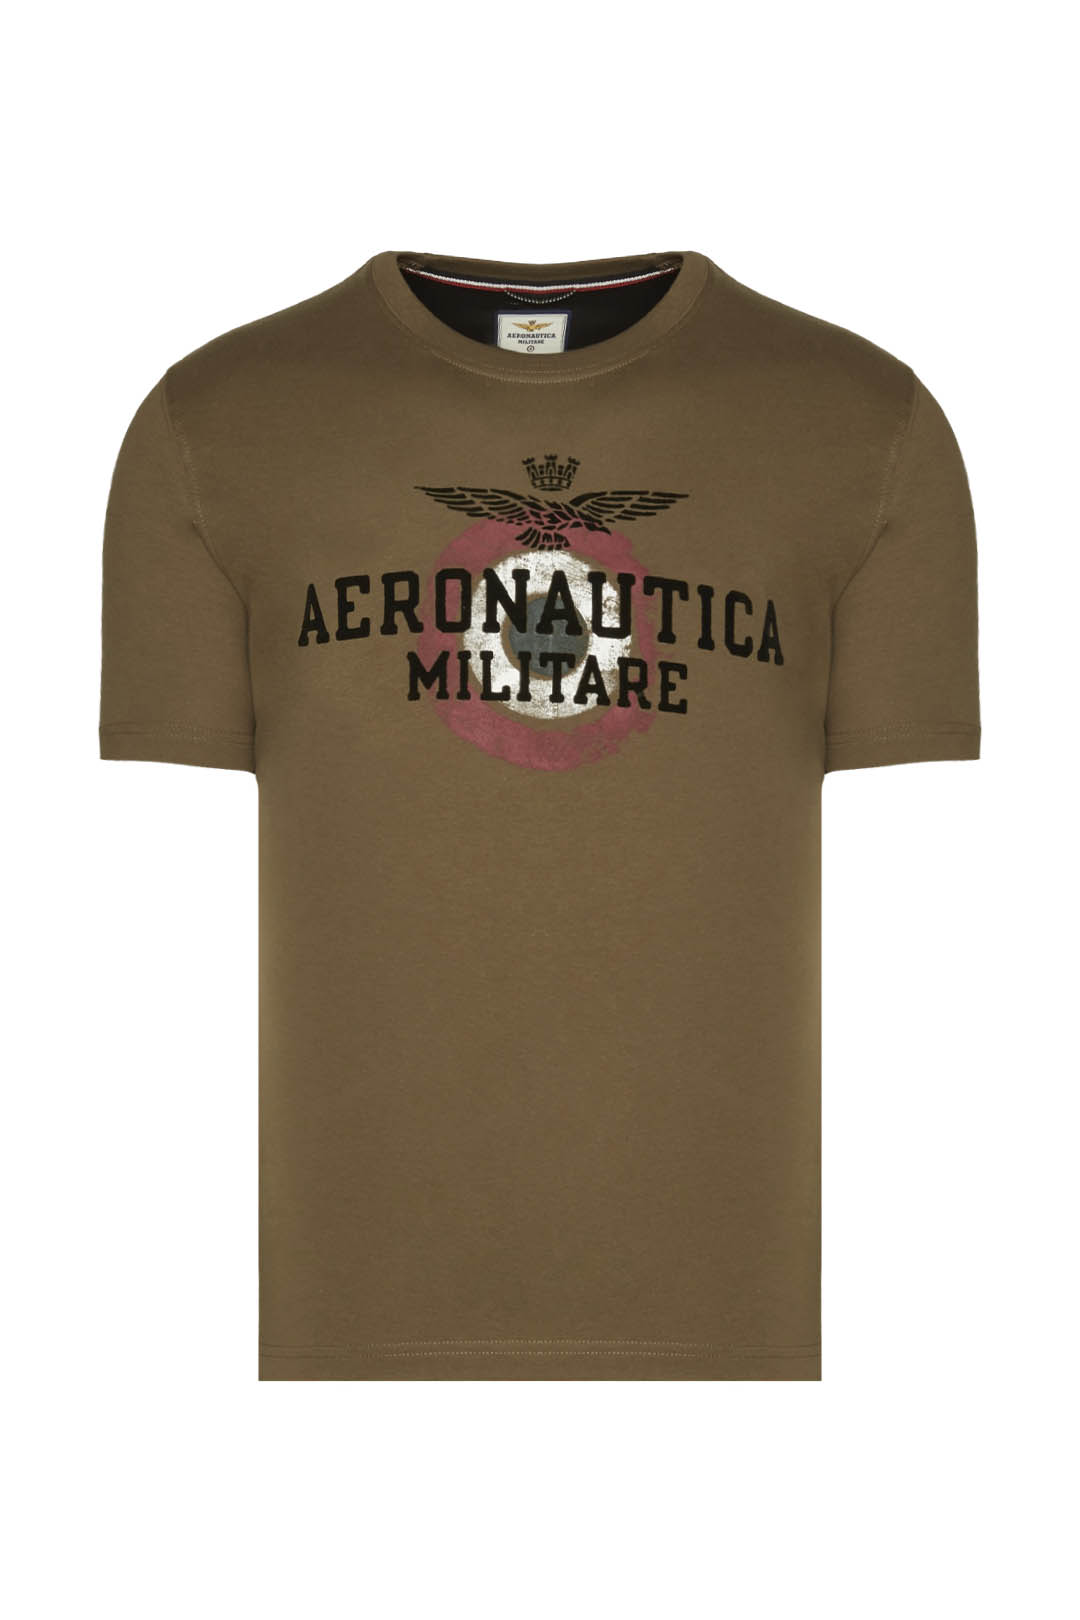 Ikonische Aeronautica Militare T-Shirt   1